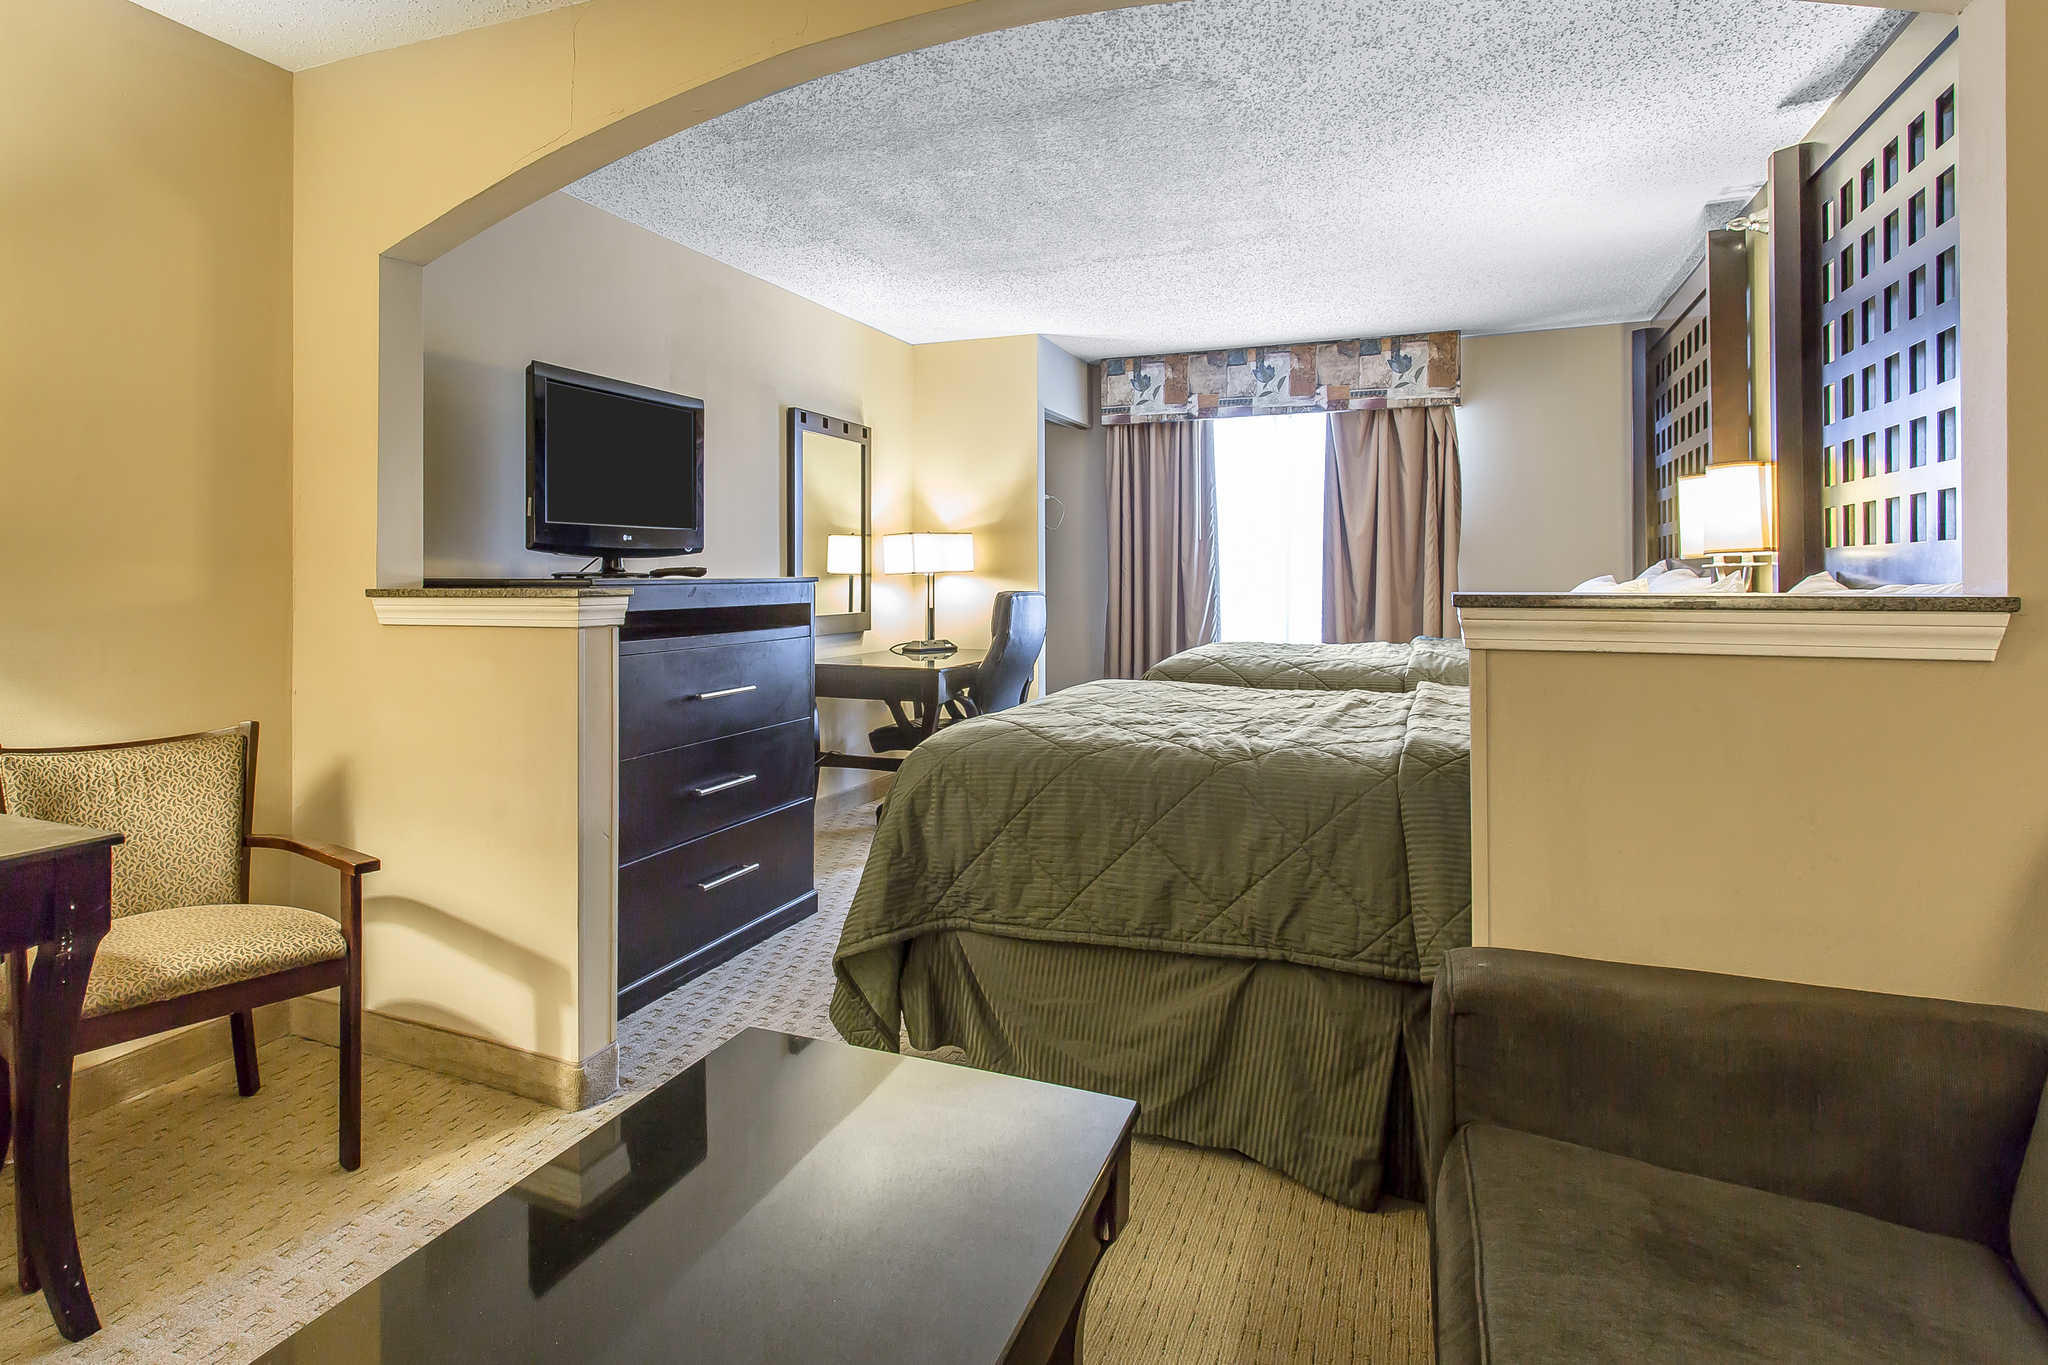 Quality Inn & Suites Durant image 20